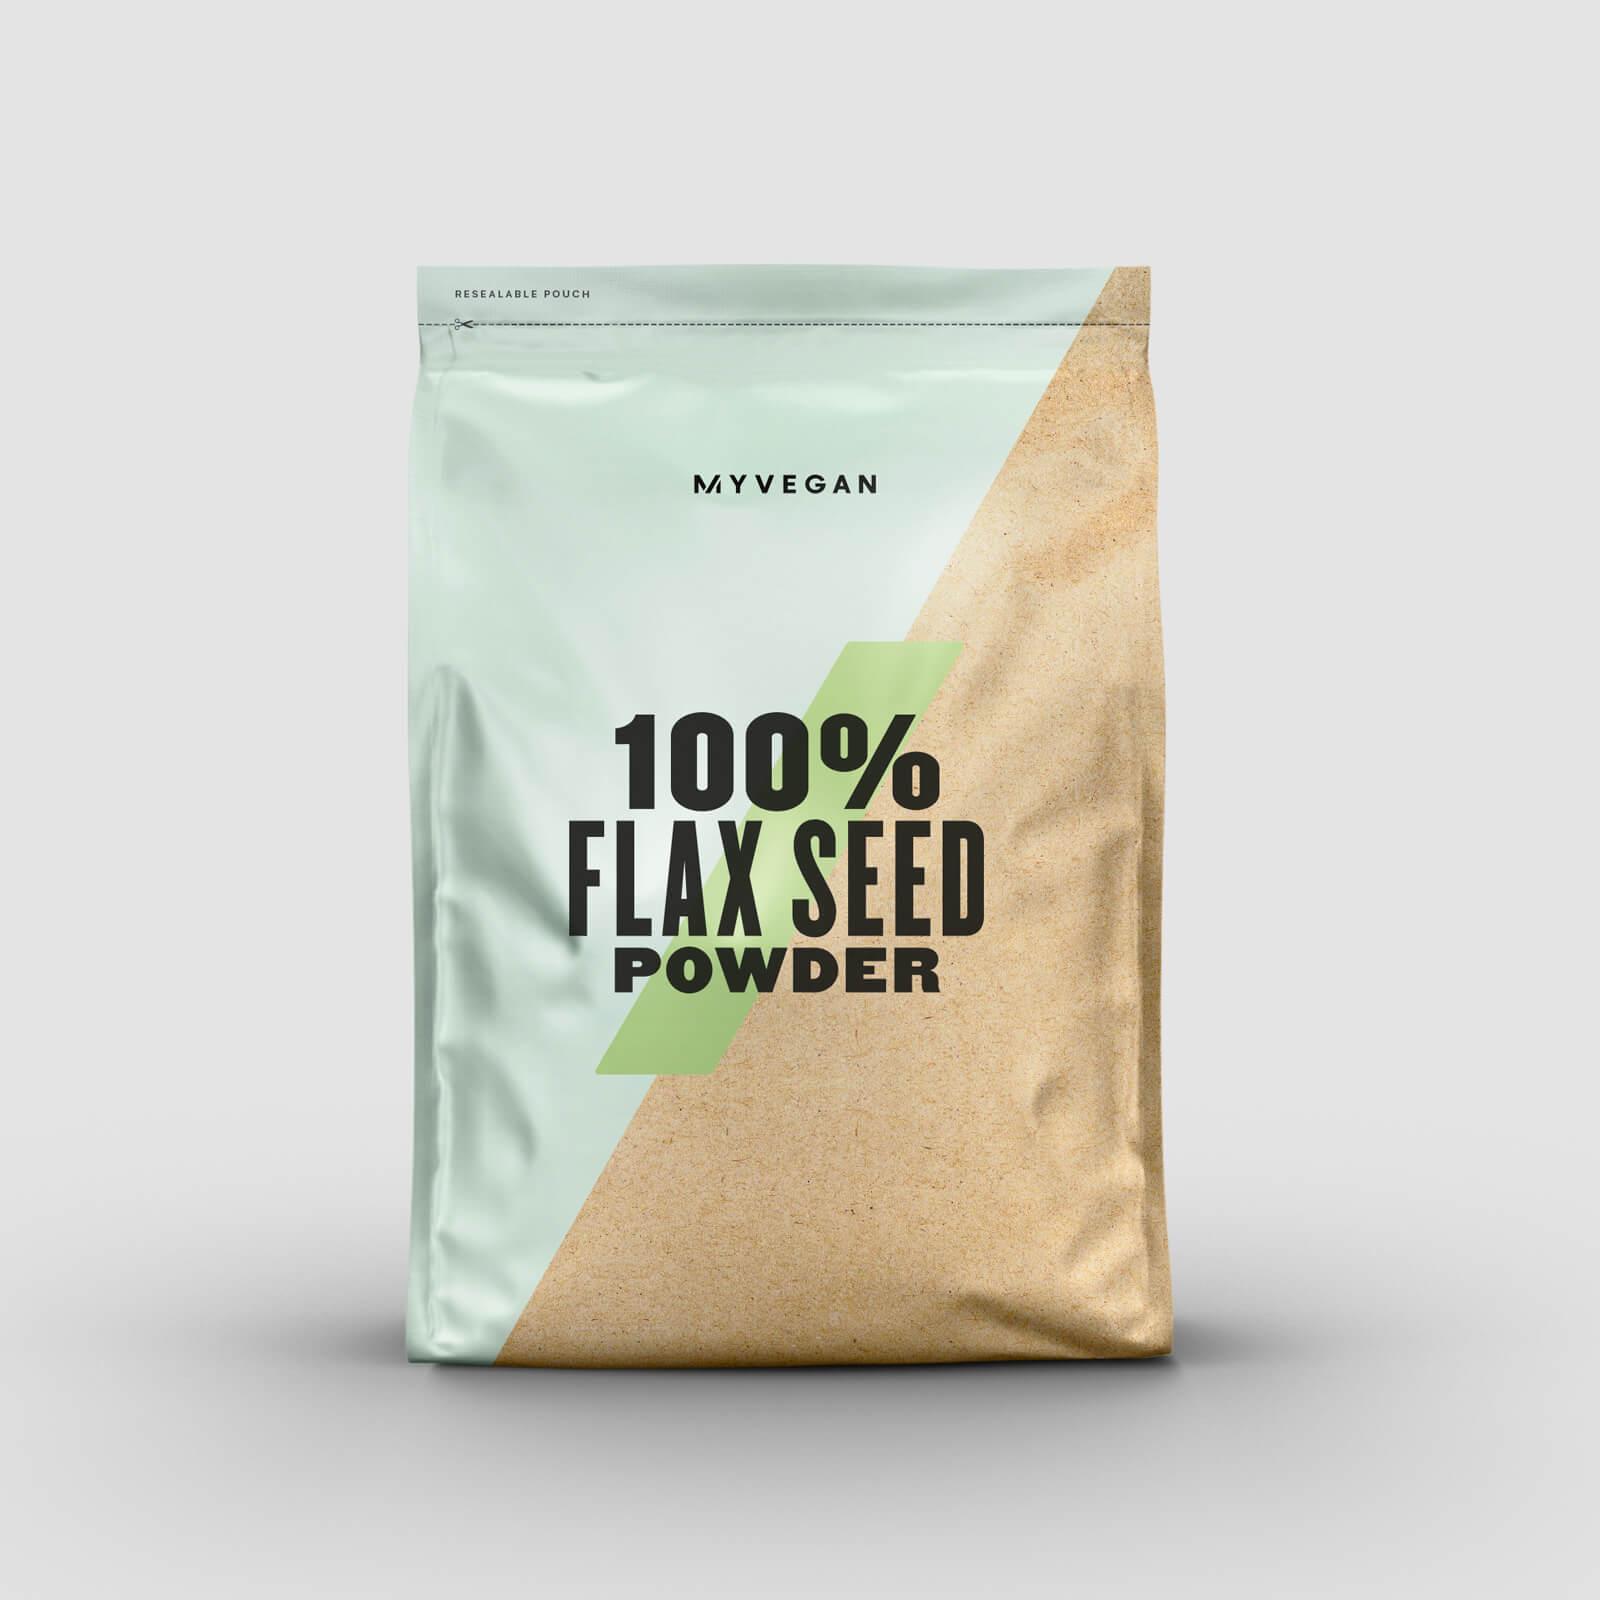 Myvegan Semi di Lino in Polvere 100% - 1kg - Senza aroma